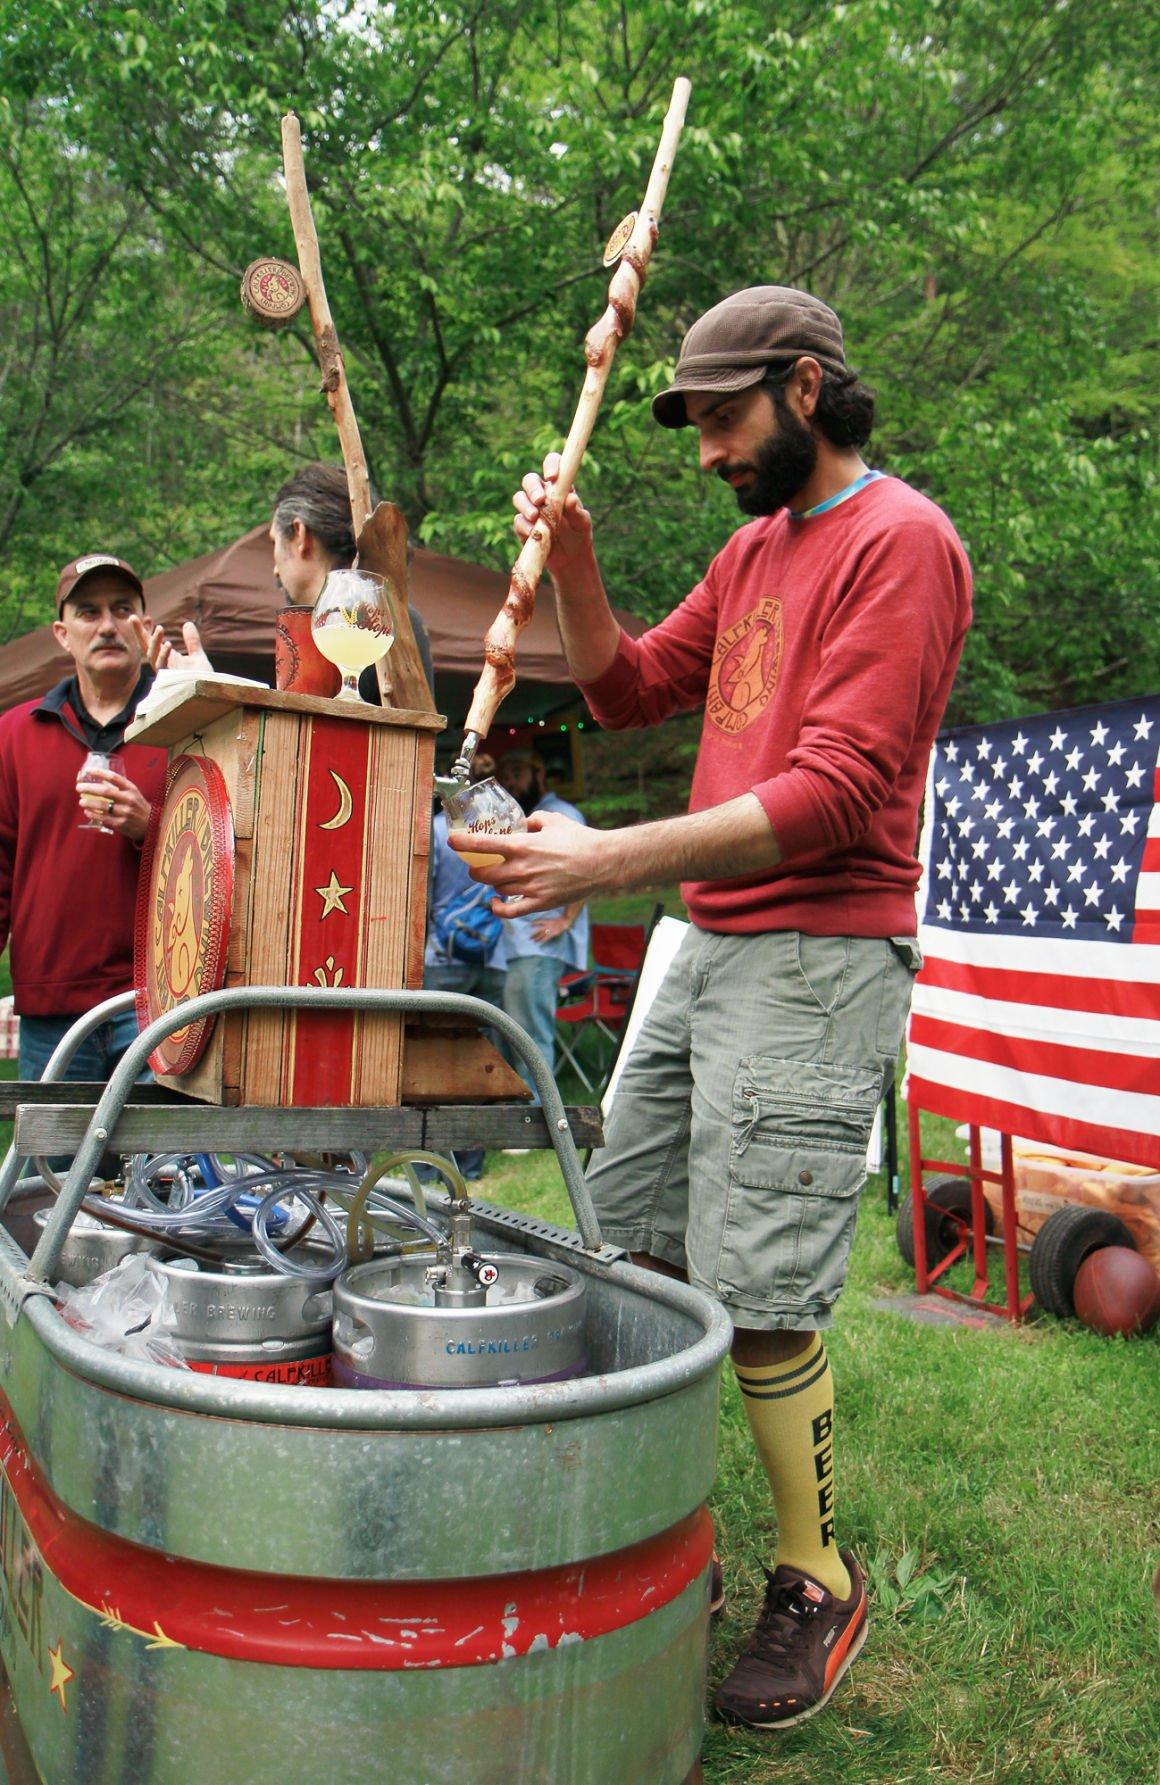 Dave Sergio pouring brews